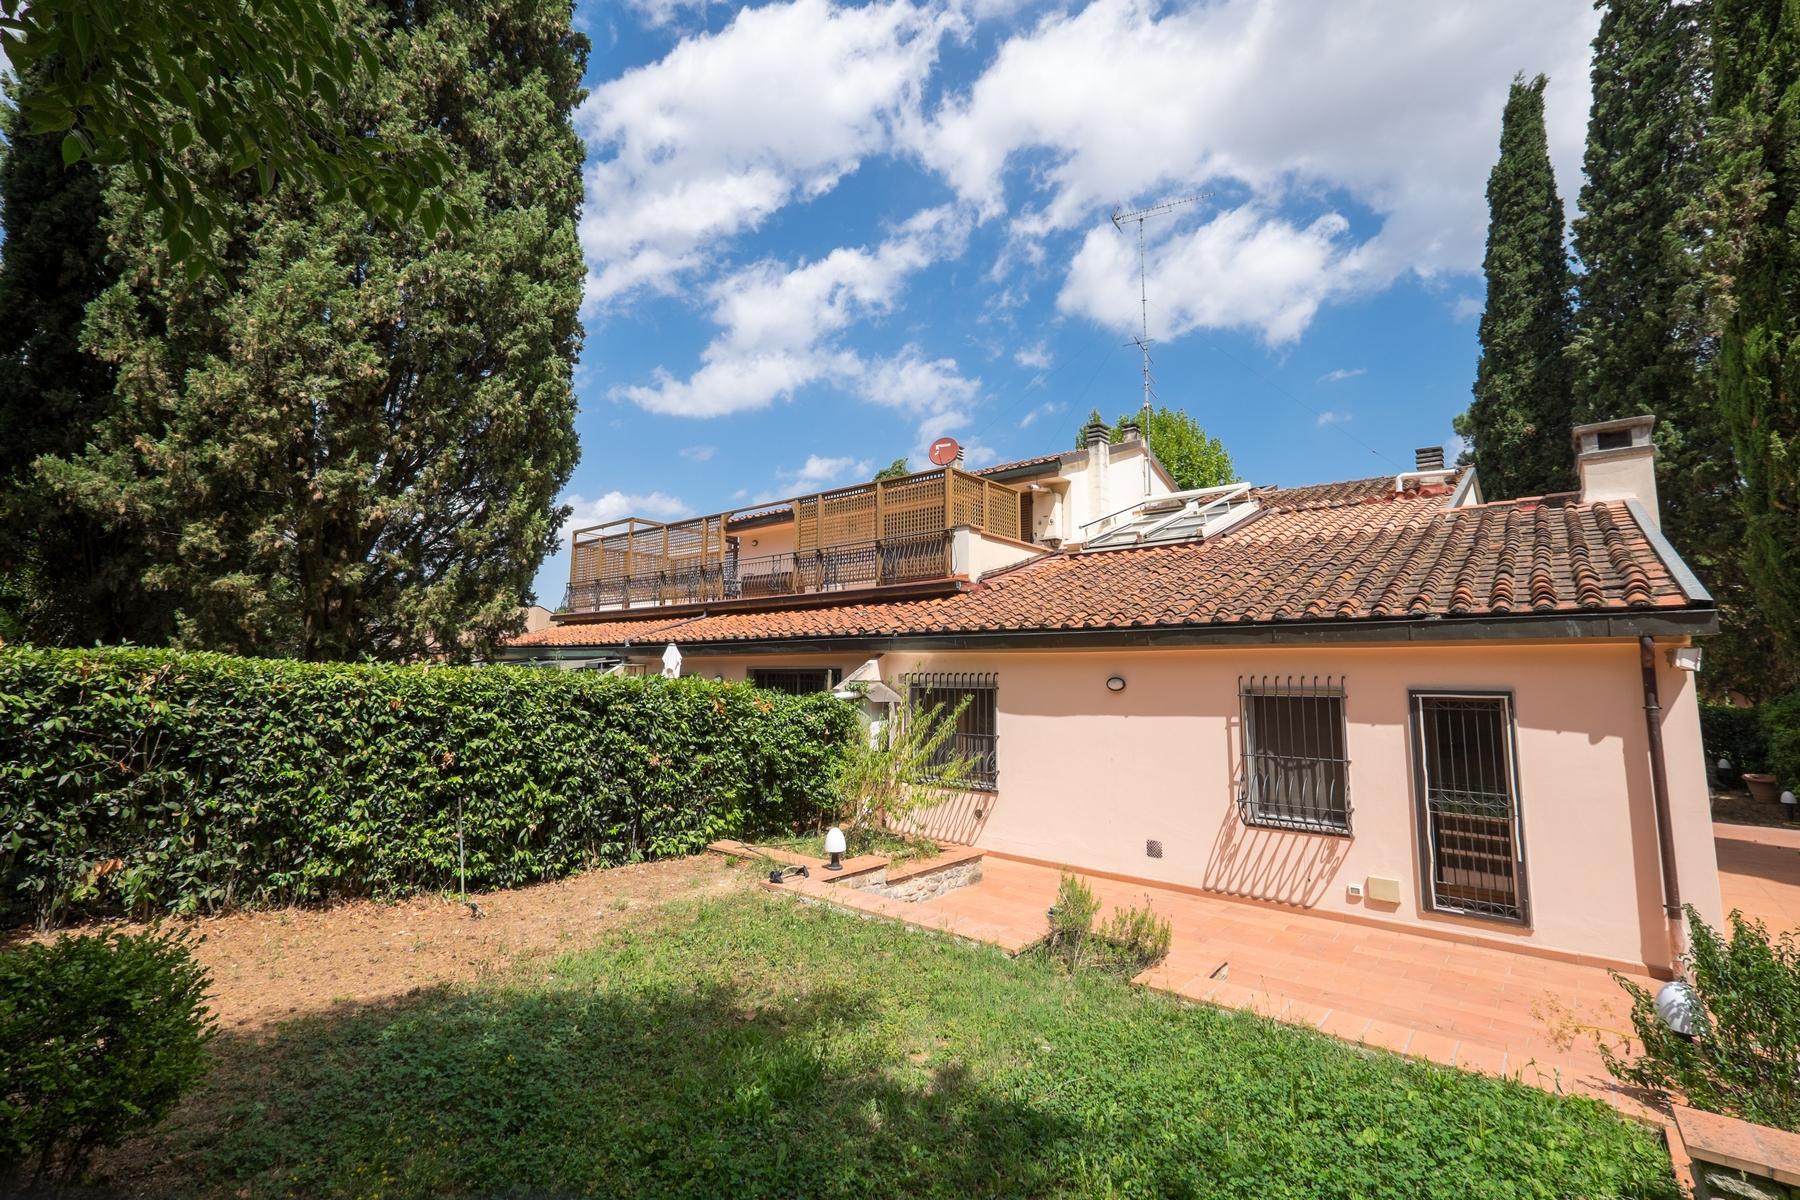 Lovely apartment in exclusive Poggio Imperiale area - 1